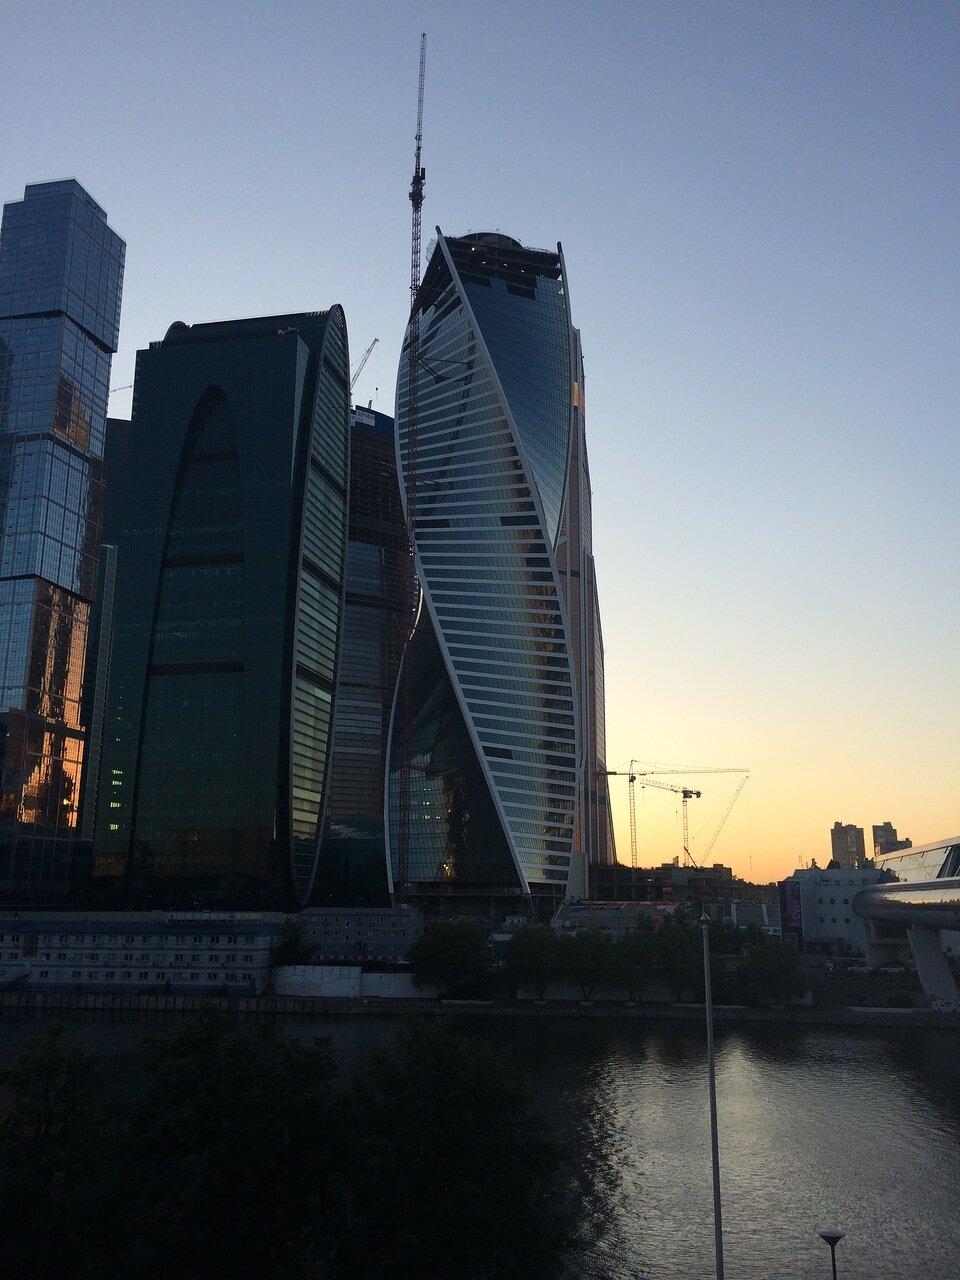 http://img-fotki.yandex.ru/get/9667/82260854.303/0_bf282_1a16f078_XXXL.jpg